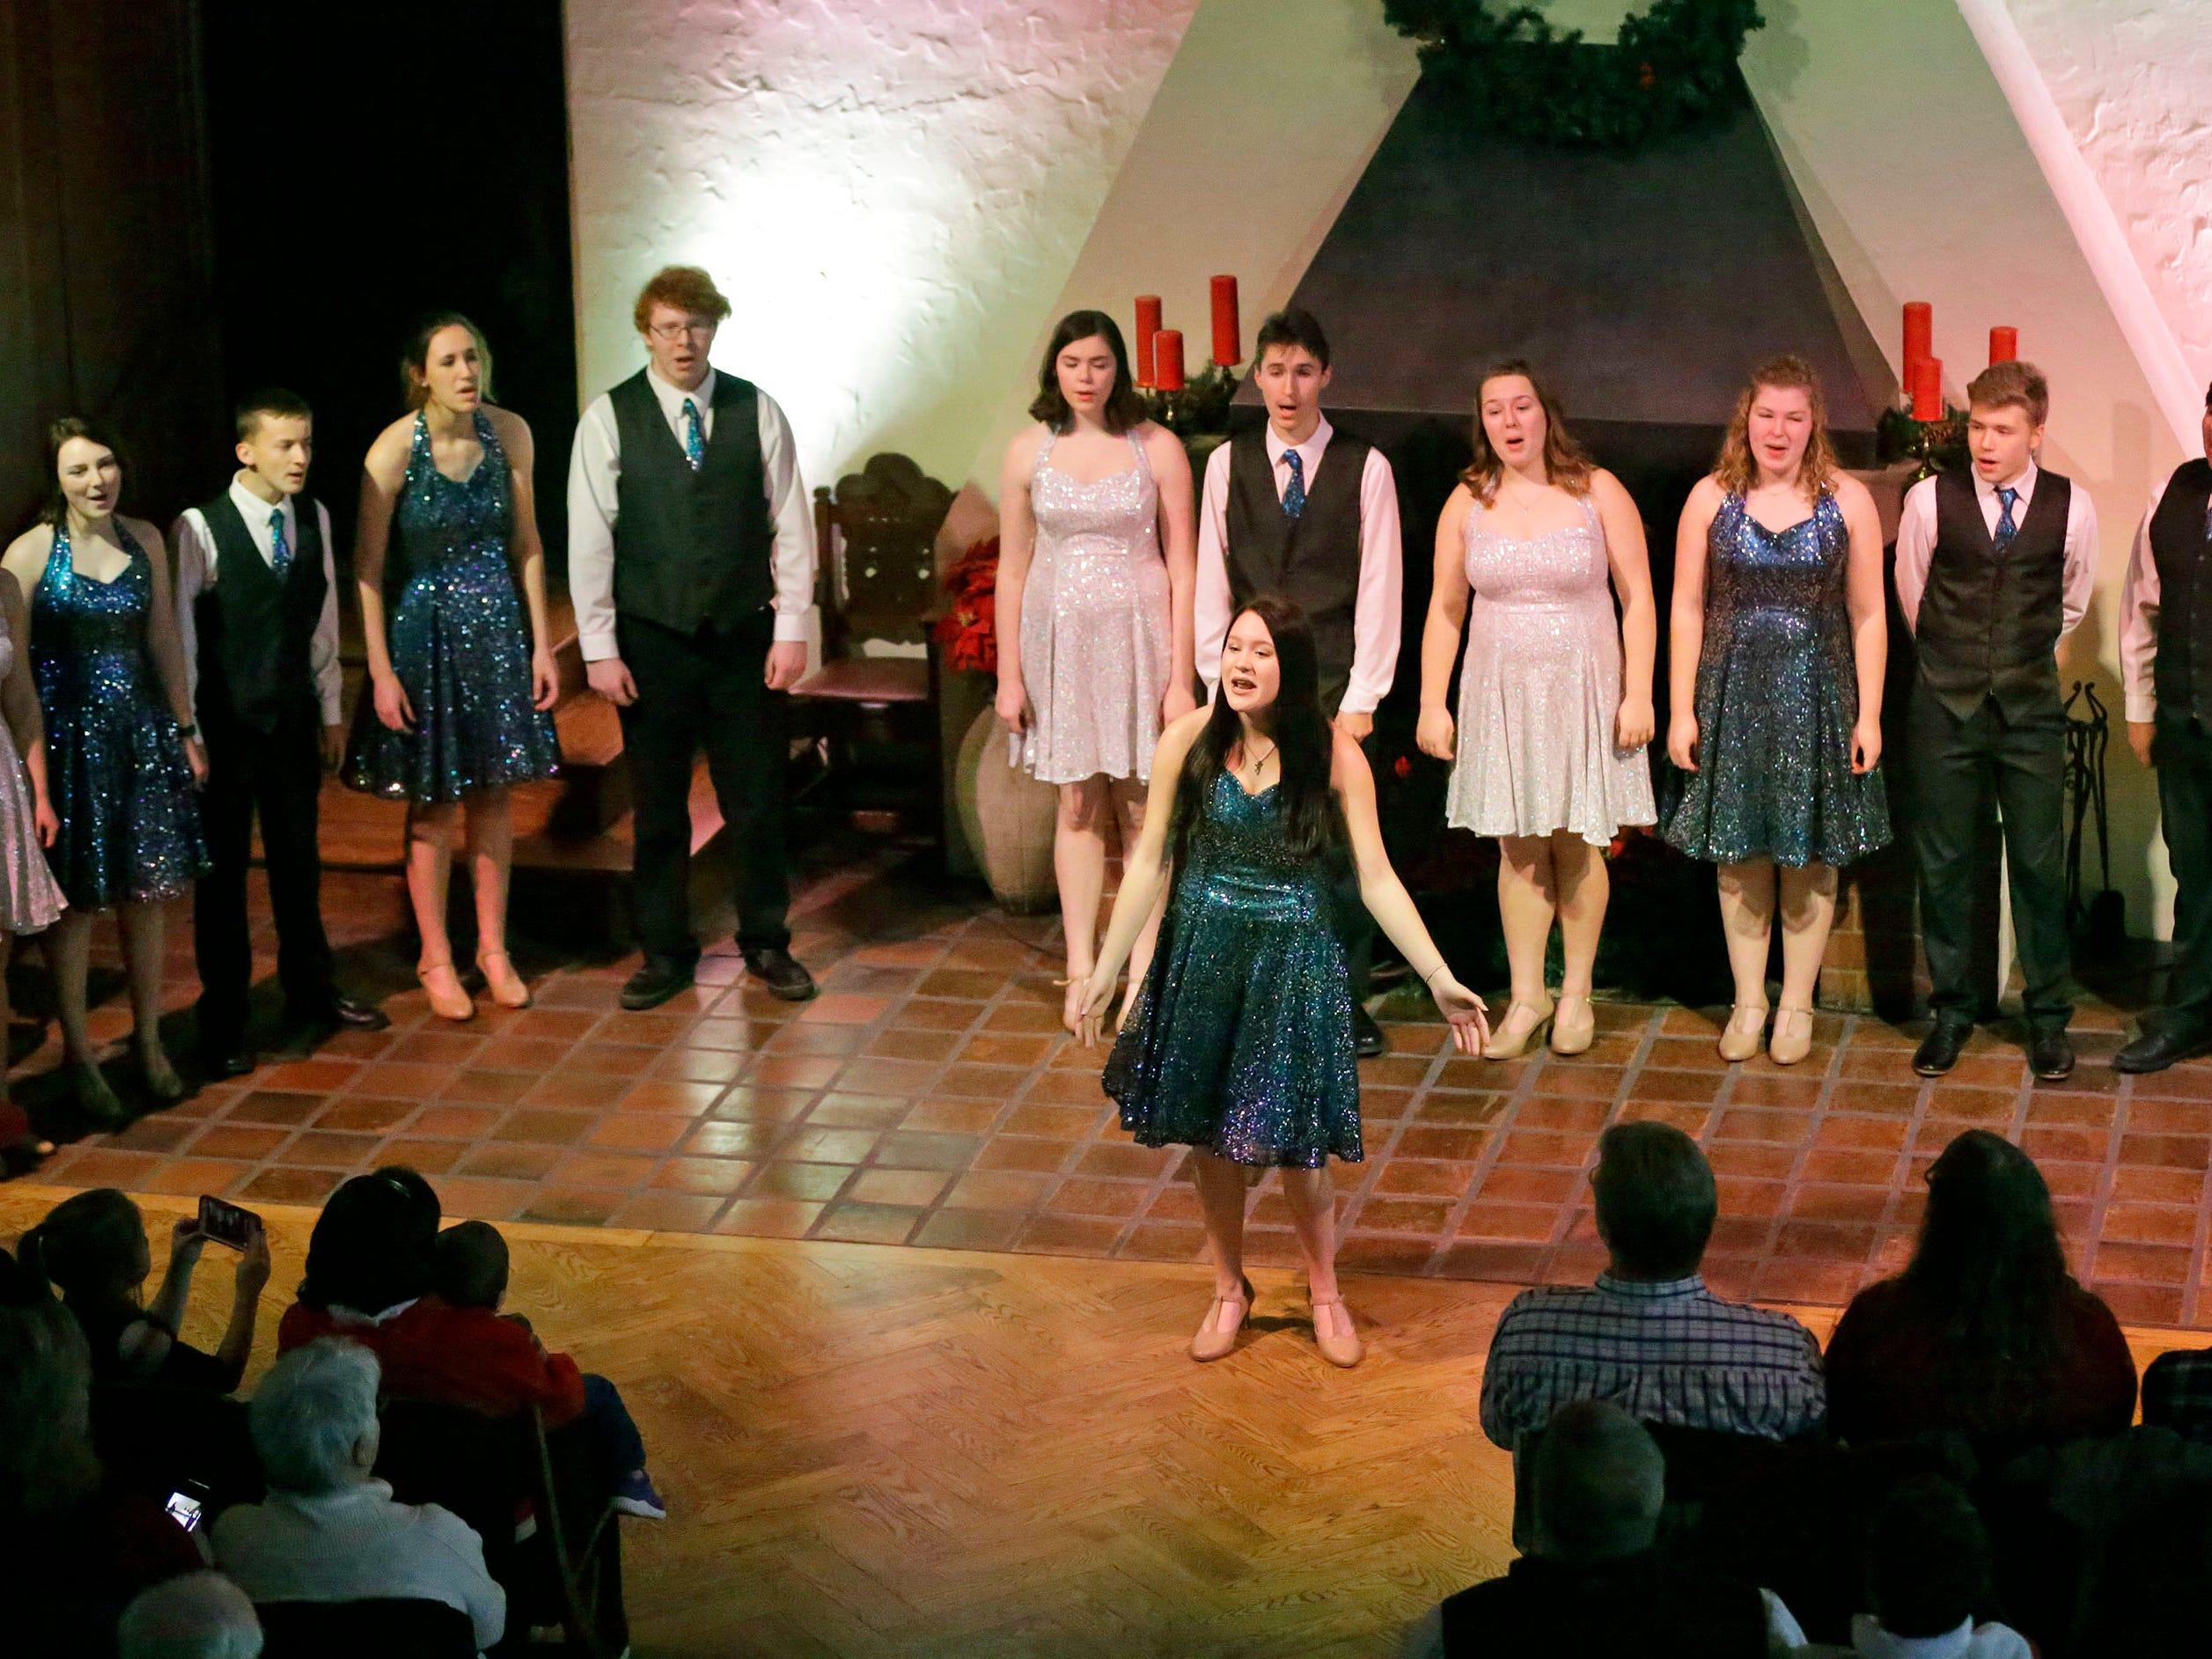 The Waves of Rhythm Show Choir from Kiel High School performs at the Waelderhaus, Saturday, December 8, 2018, in Kohler, Wis.